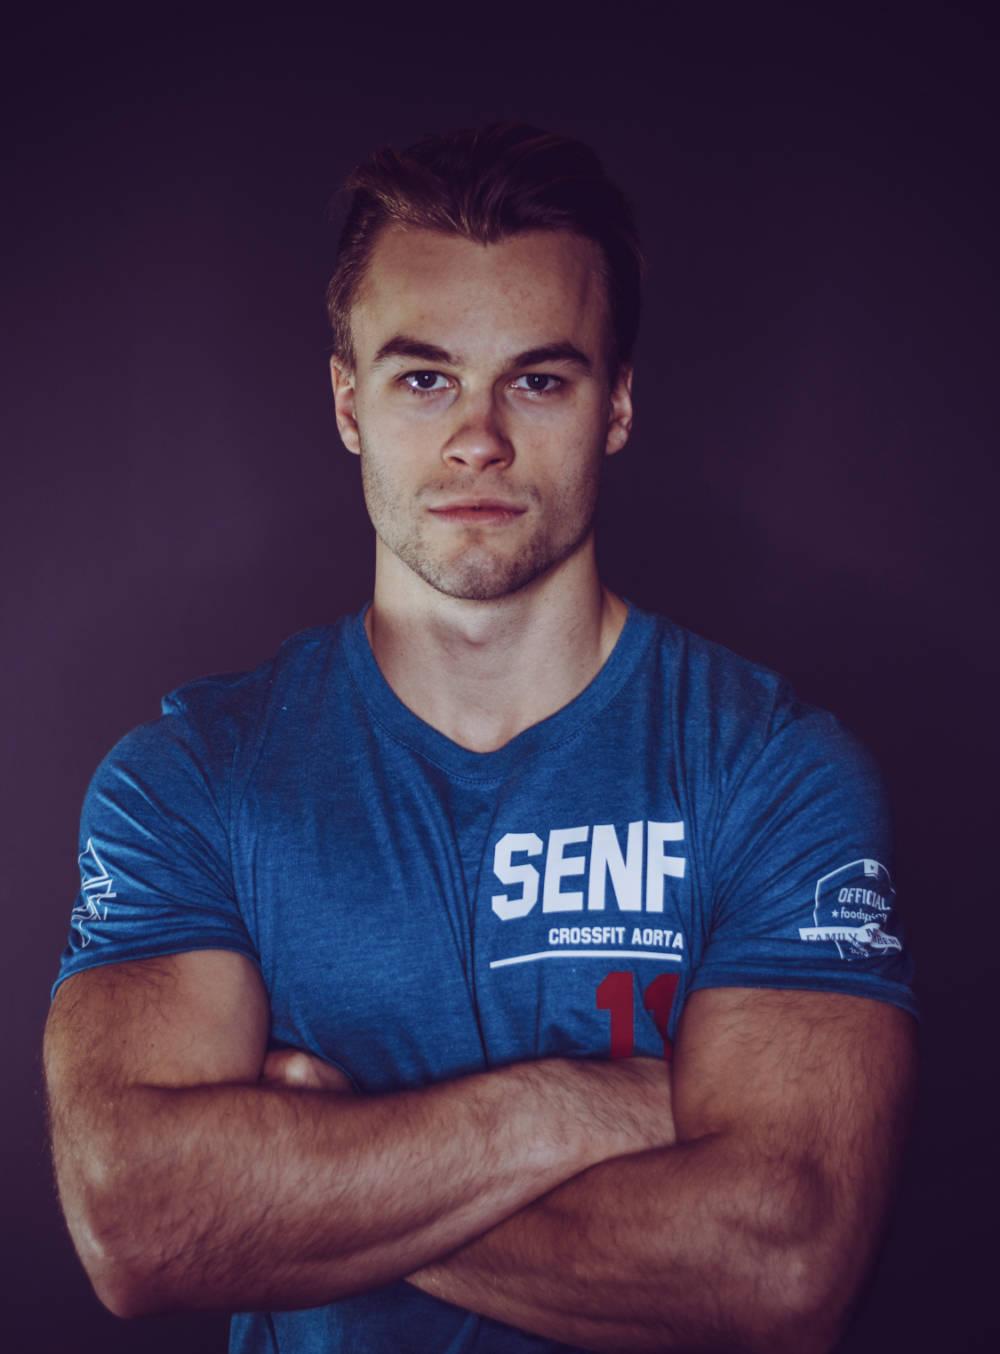 Hendrik Senf